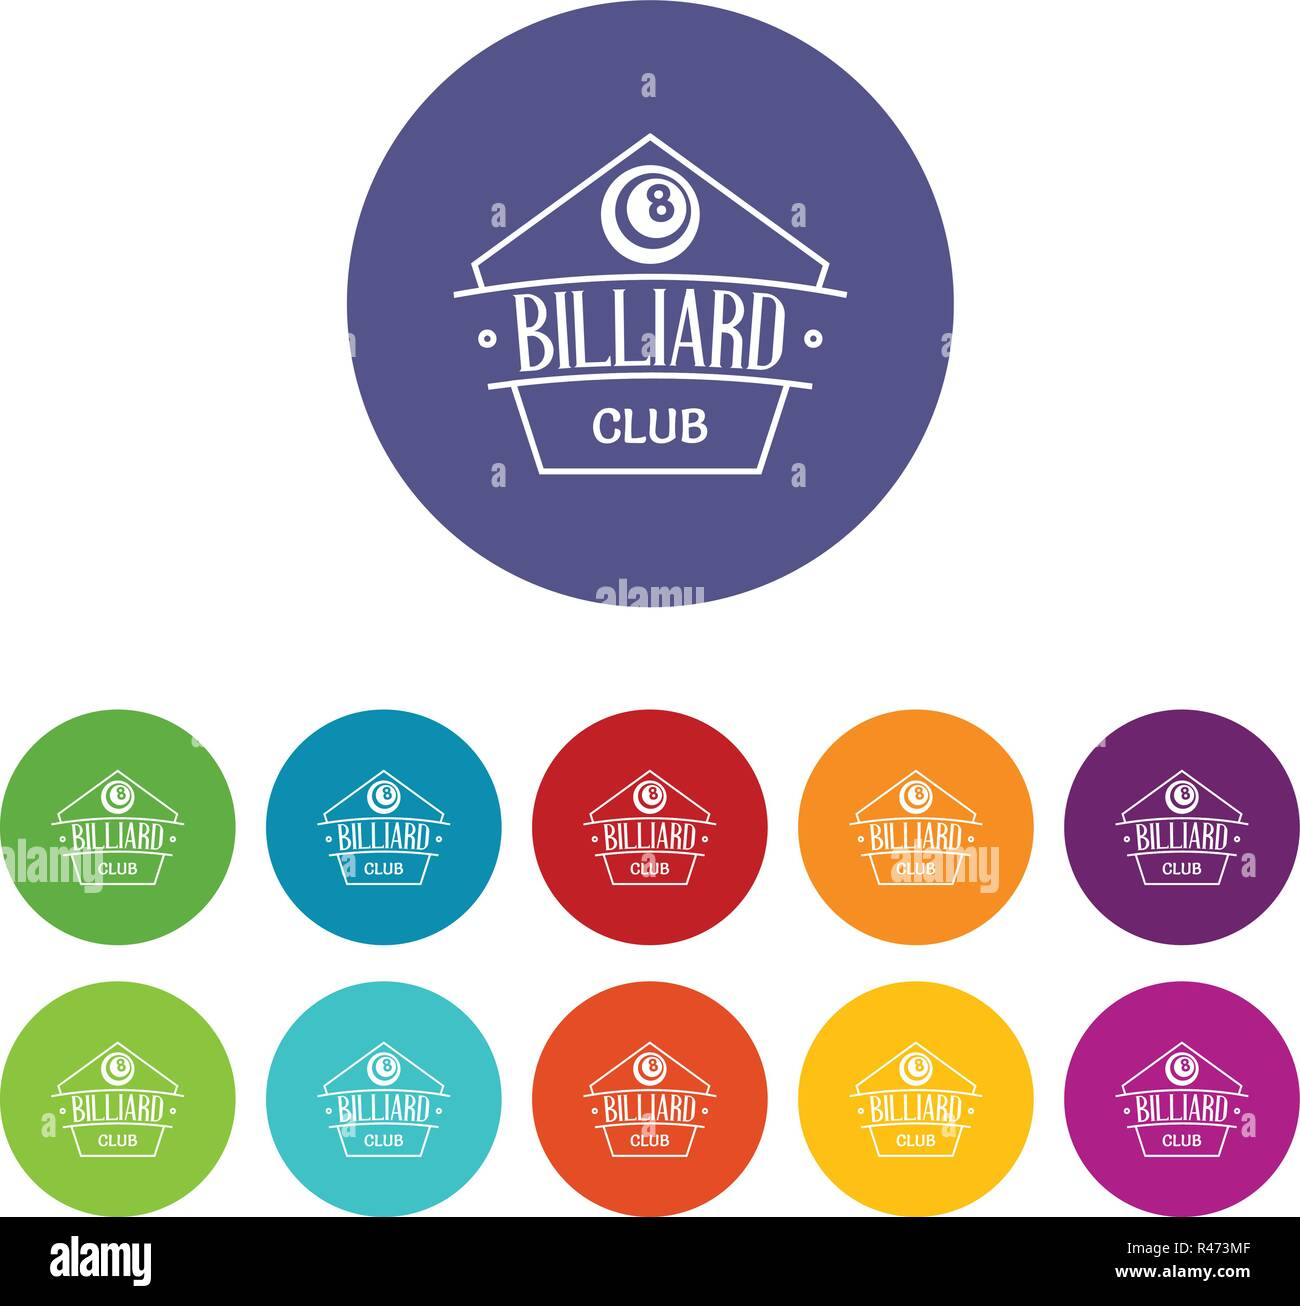 Billiard icons set vector color - Stock Image